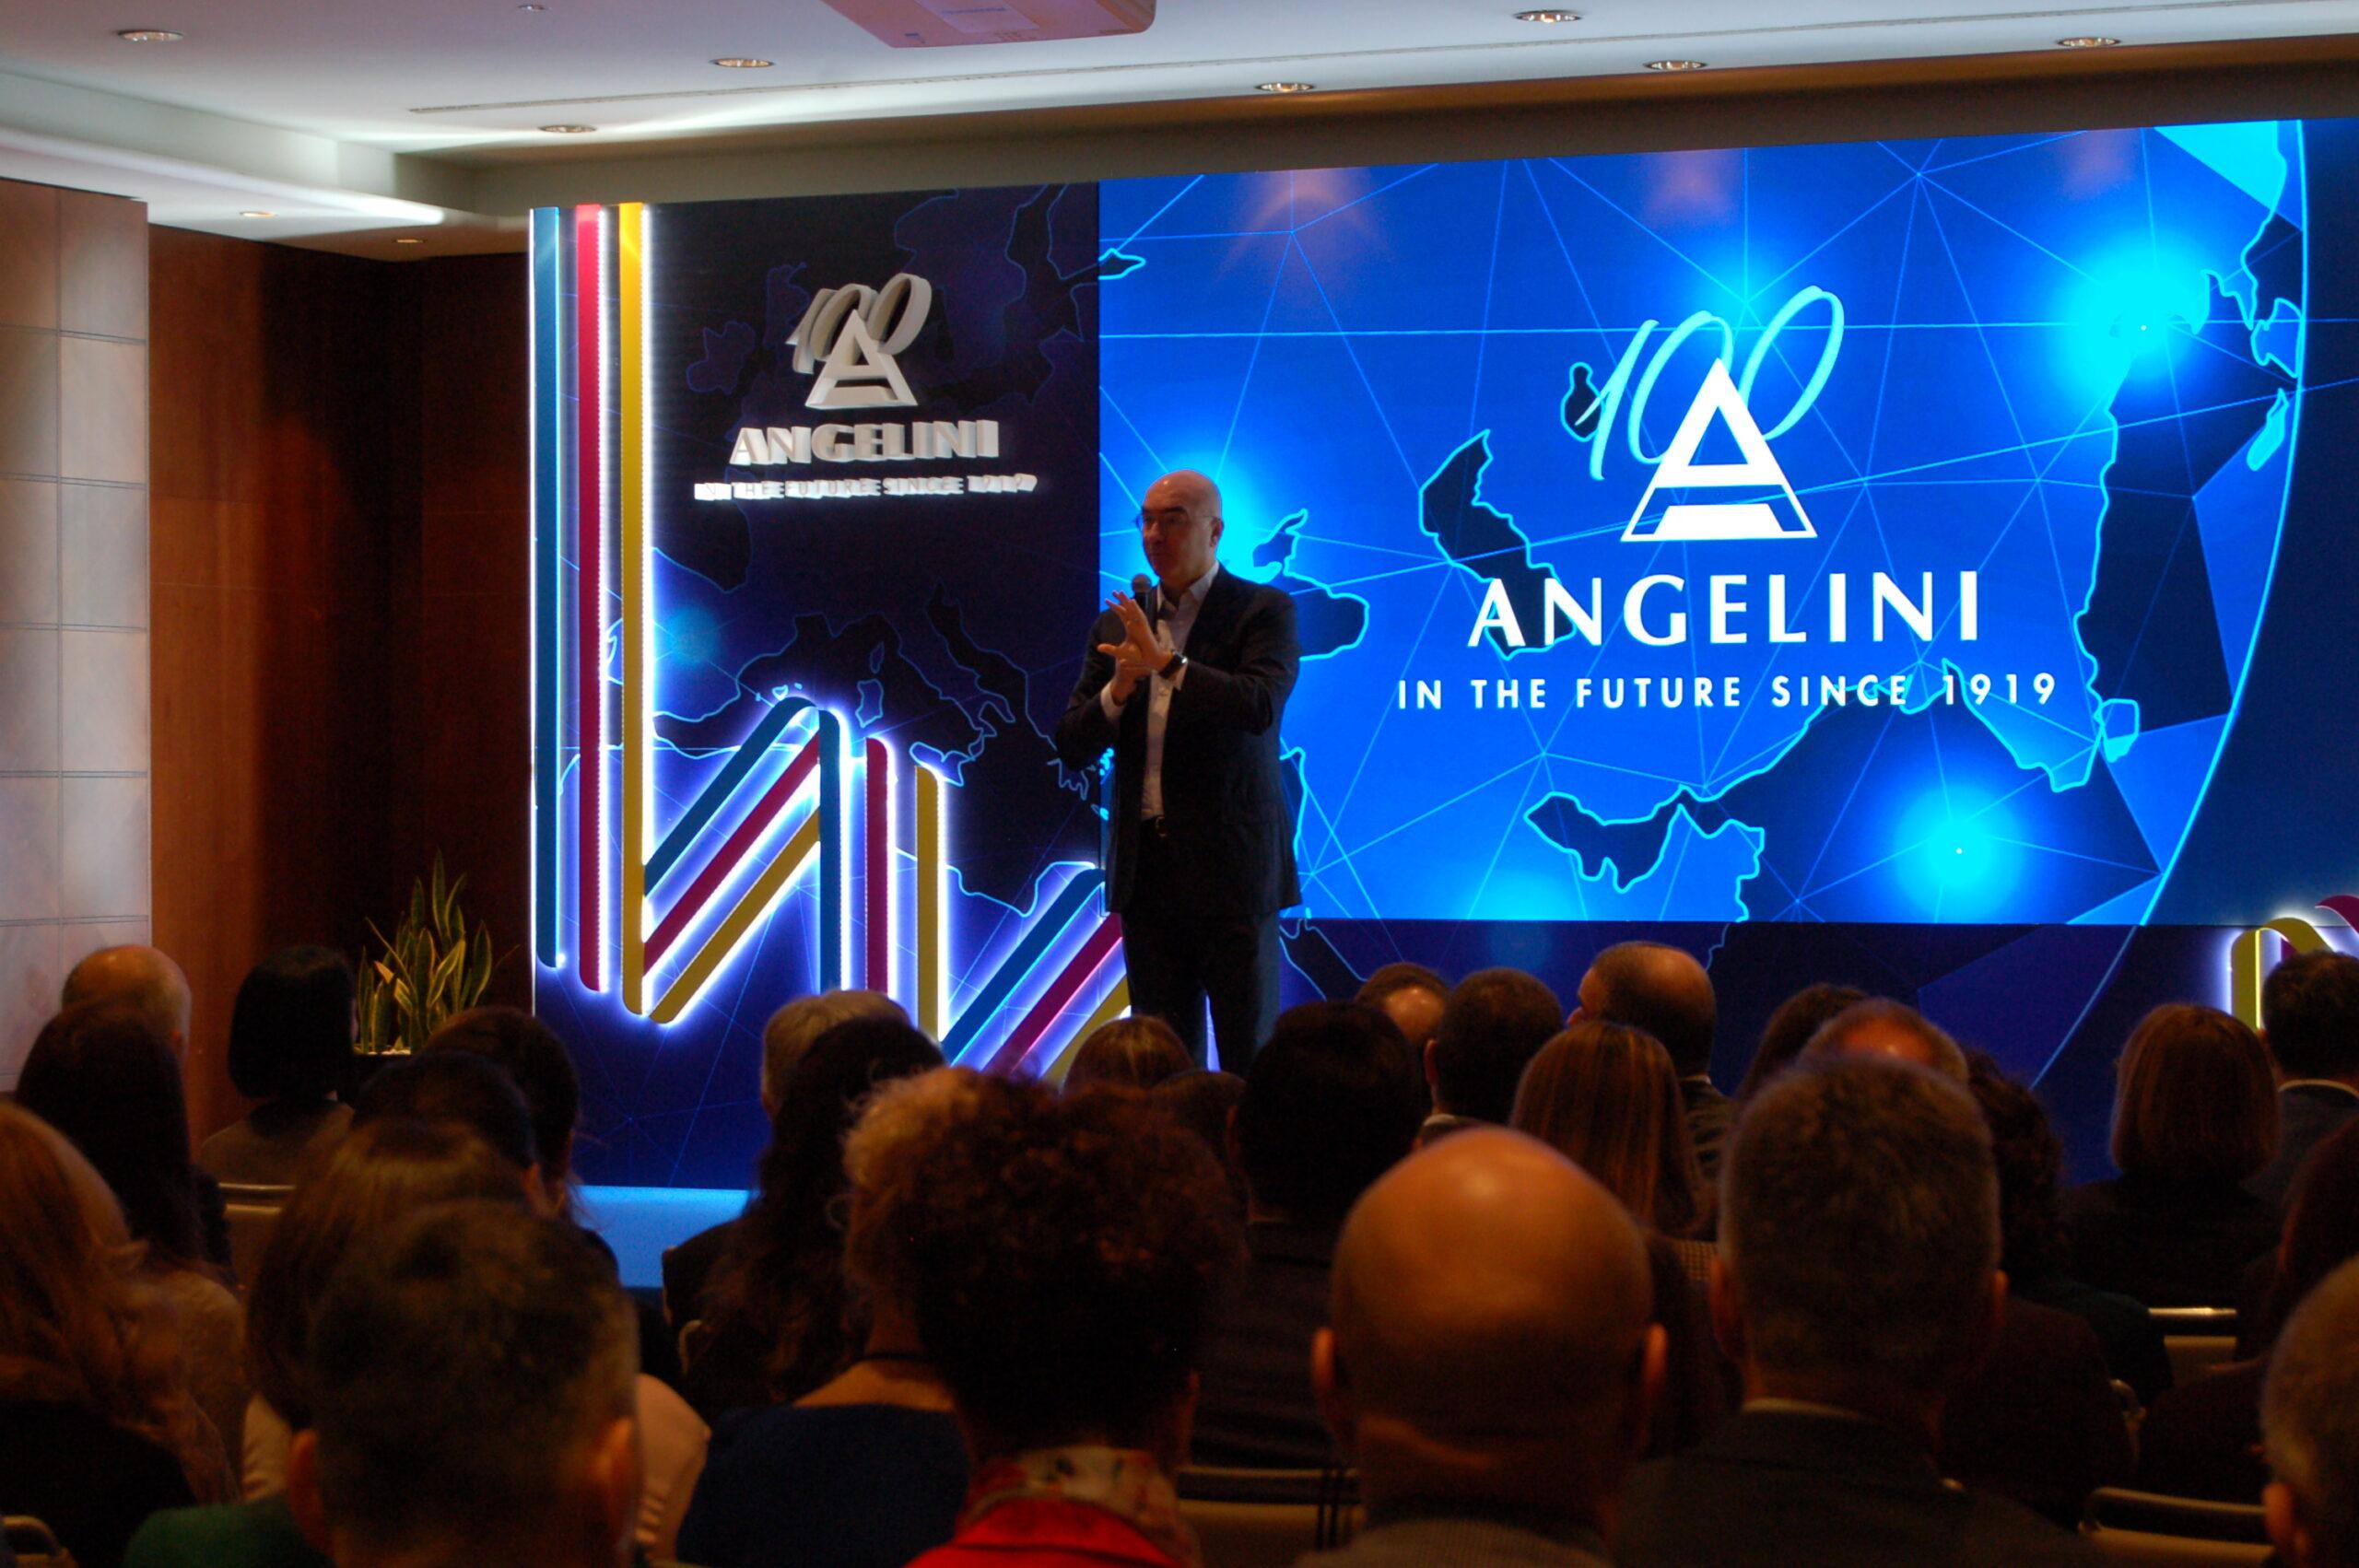 https://www.fareservizitecnici.it/wp-content/uploads/2020/02/Angelini-evento-03-scaled.jpg